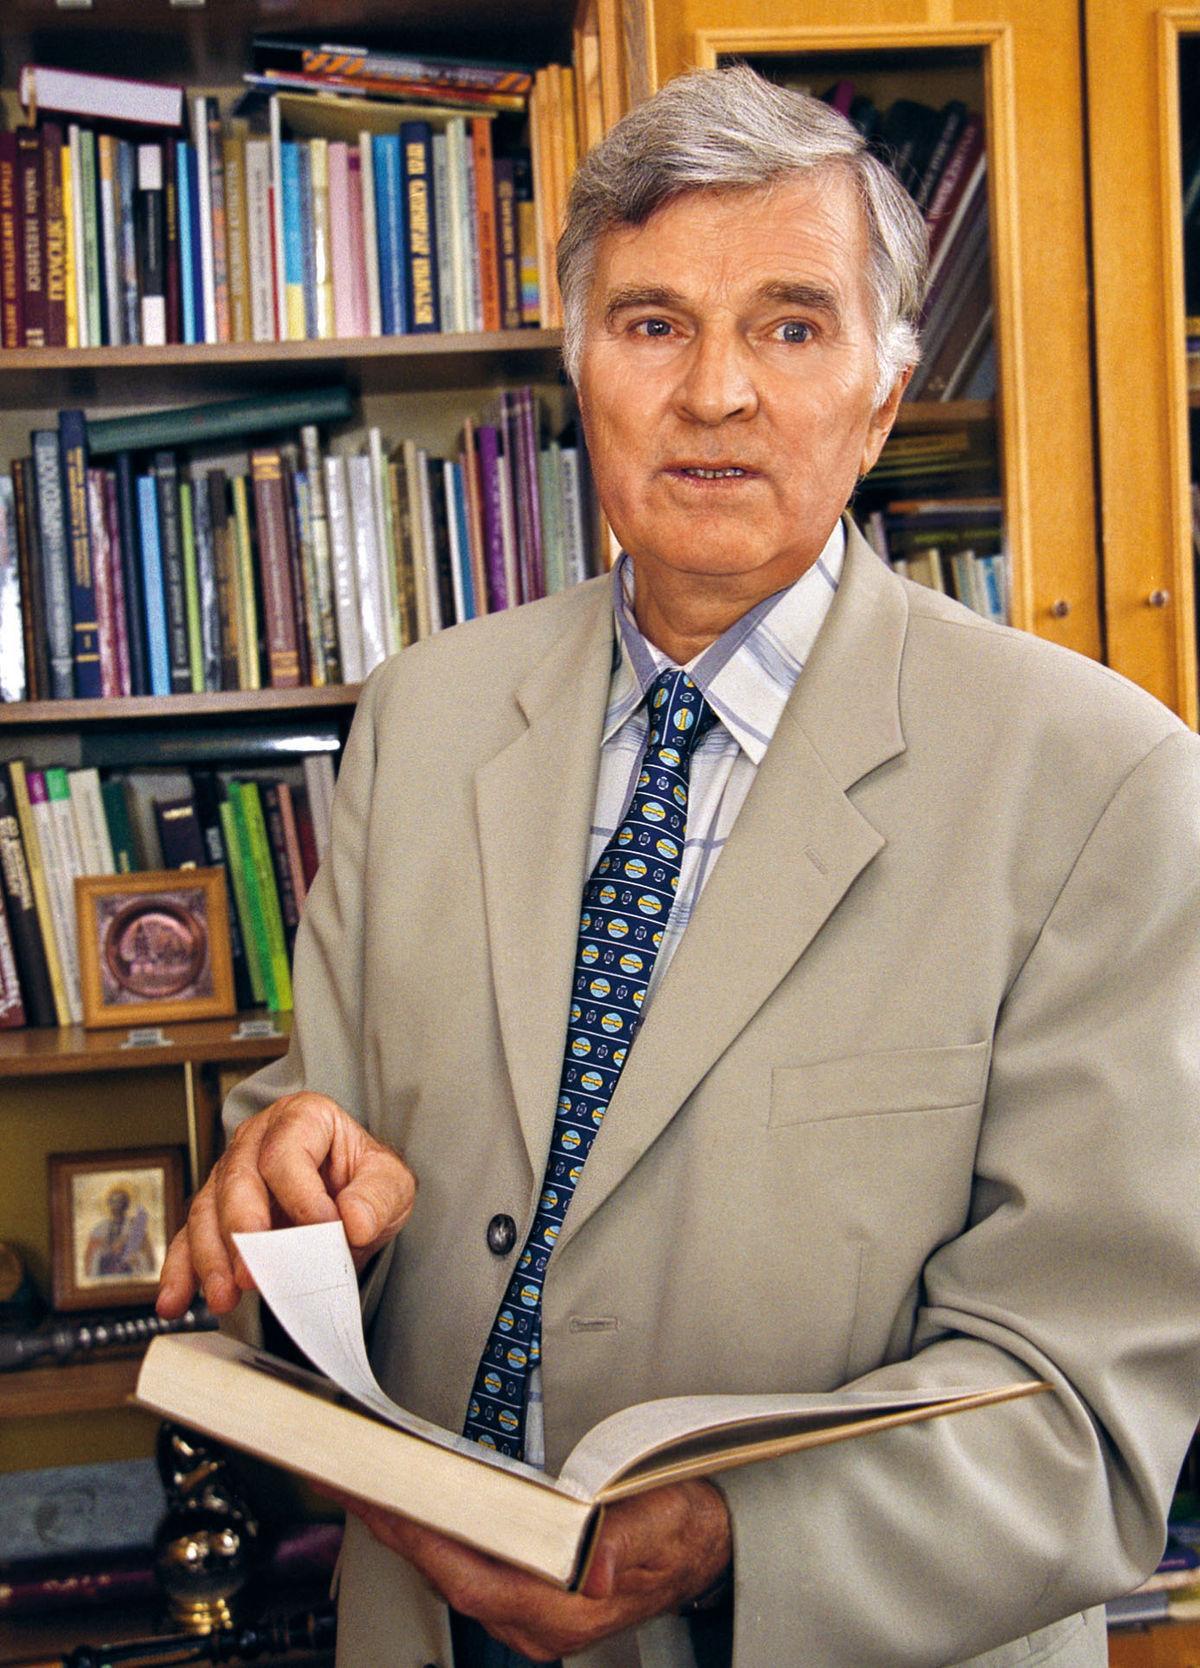 Петр Петрович Толочко – известный украинский историк / wikipedia.org